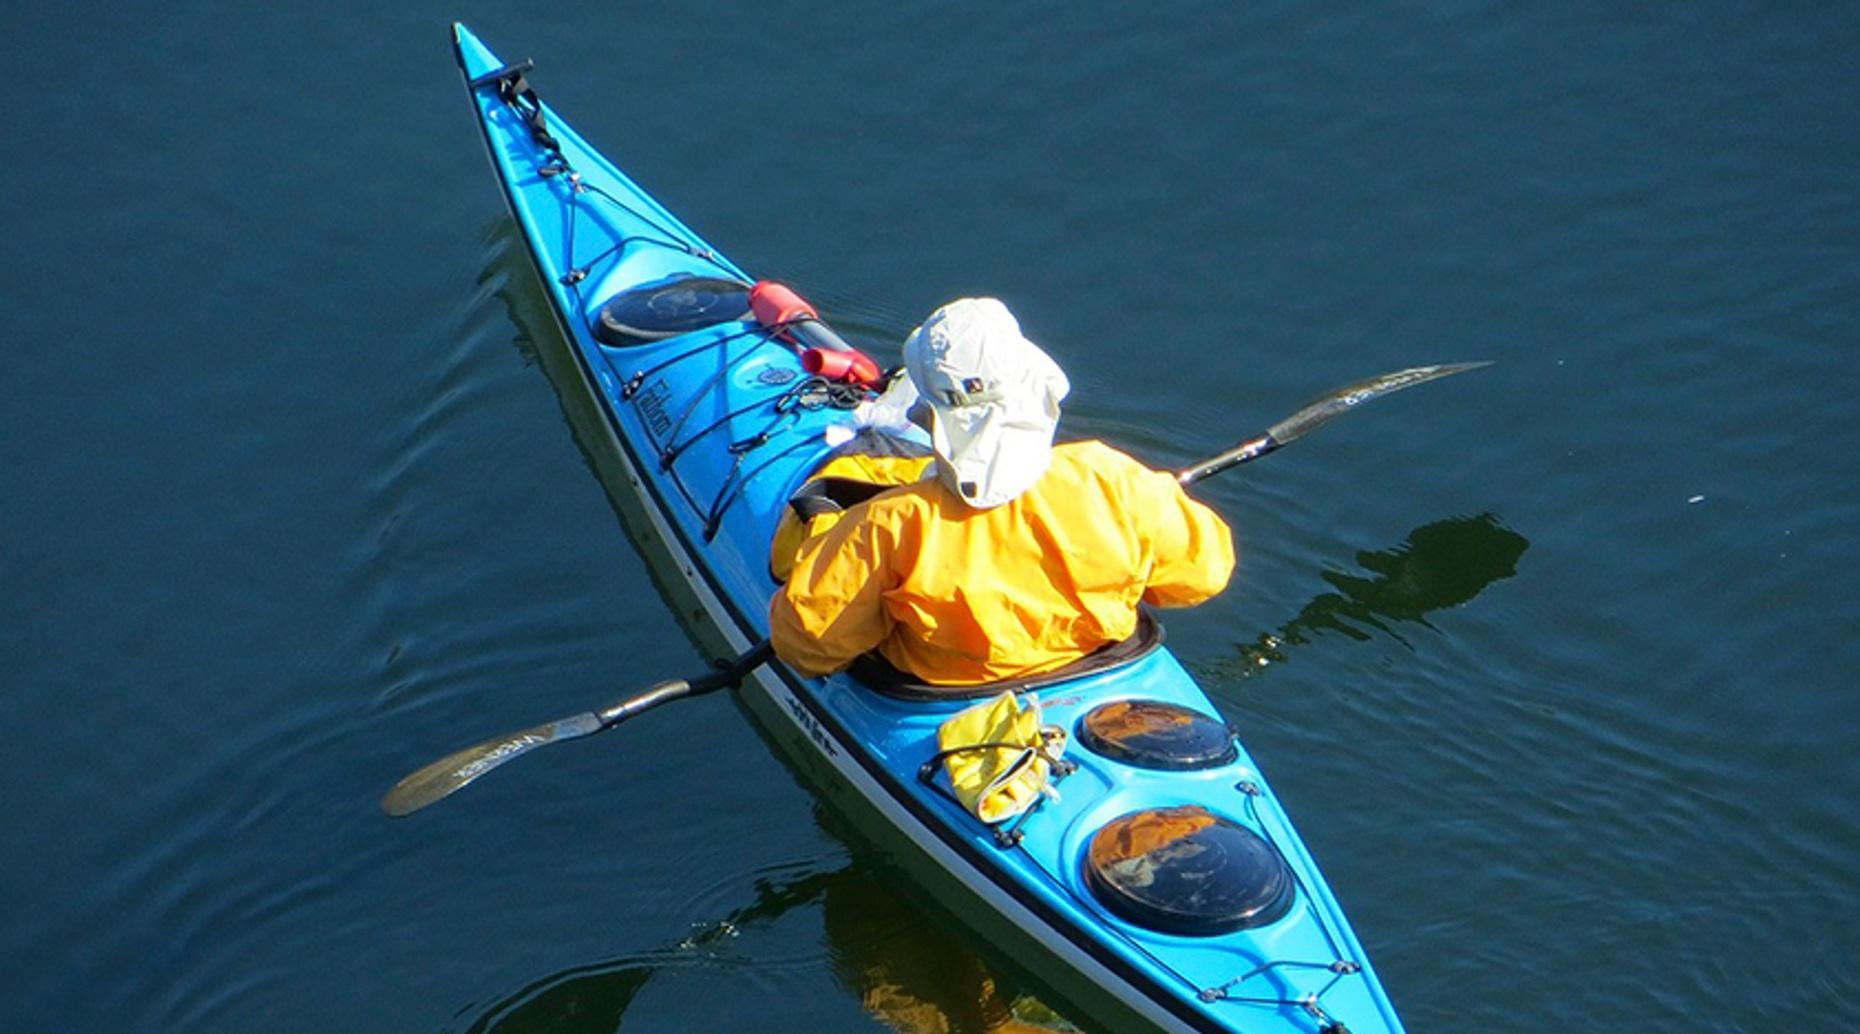 Hilton Head Kayaking and Fireworks Dolphin Tour